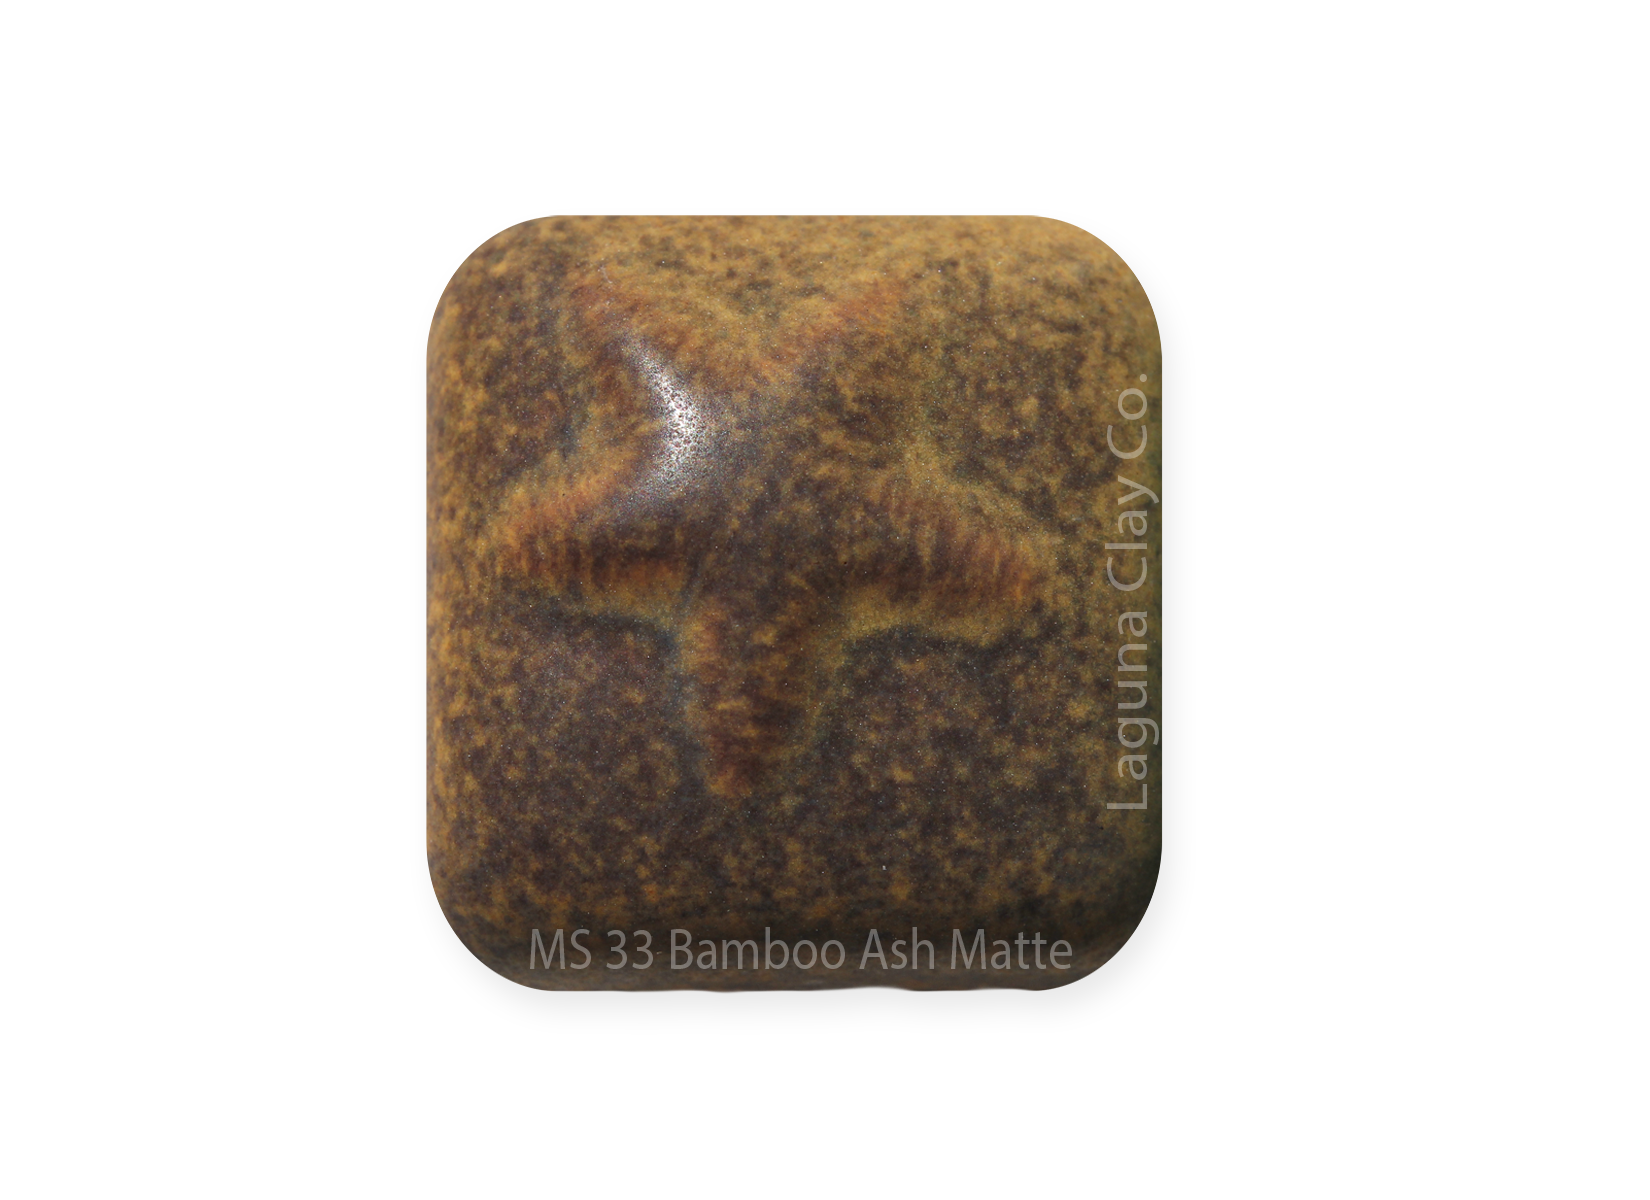 MS-33 Bamboo Ash Matte